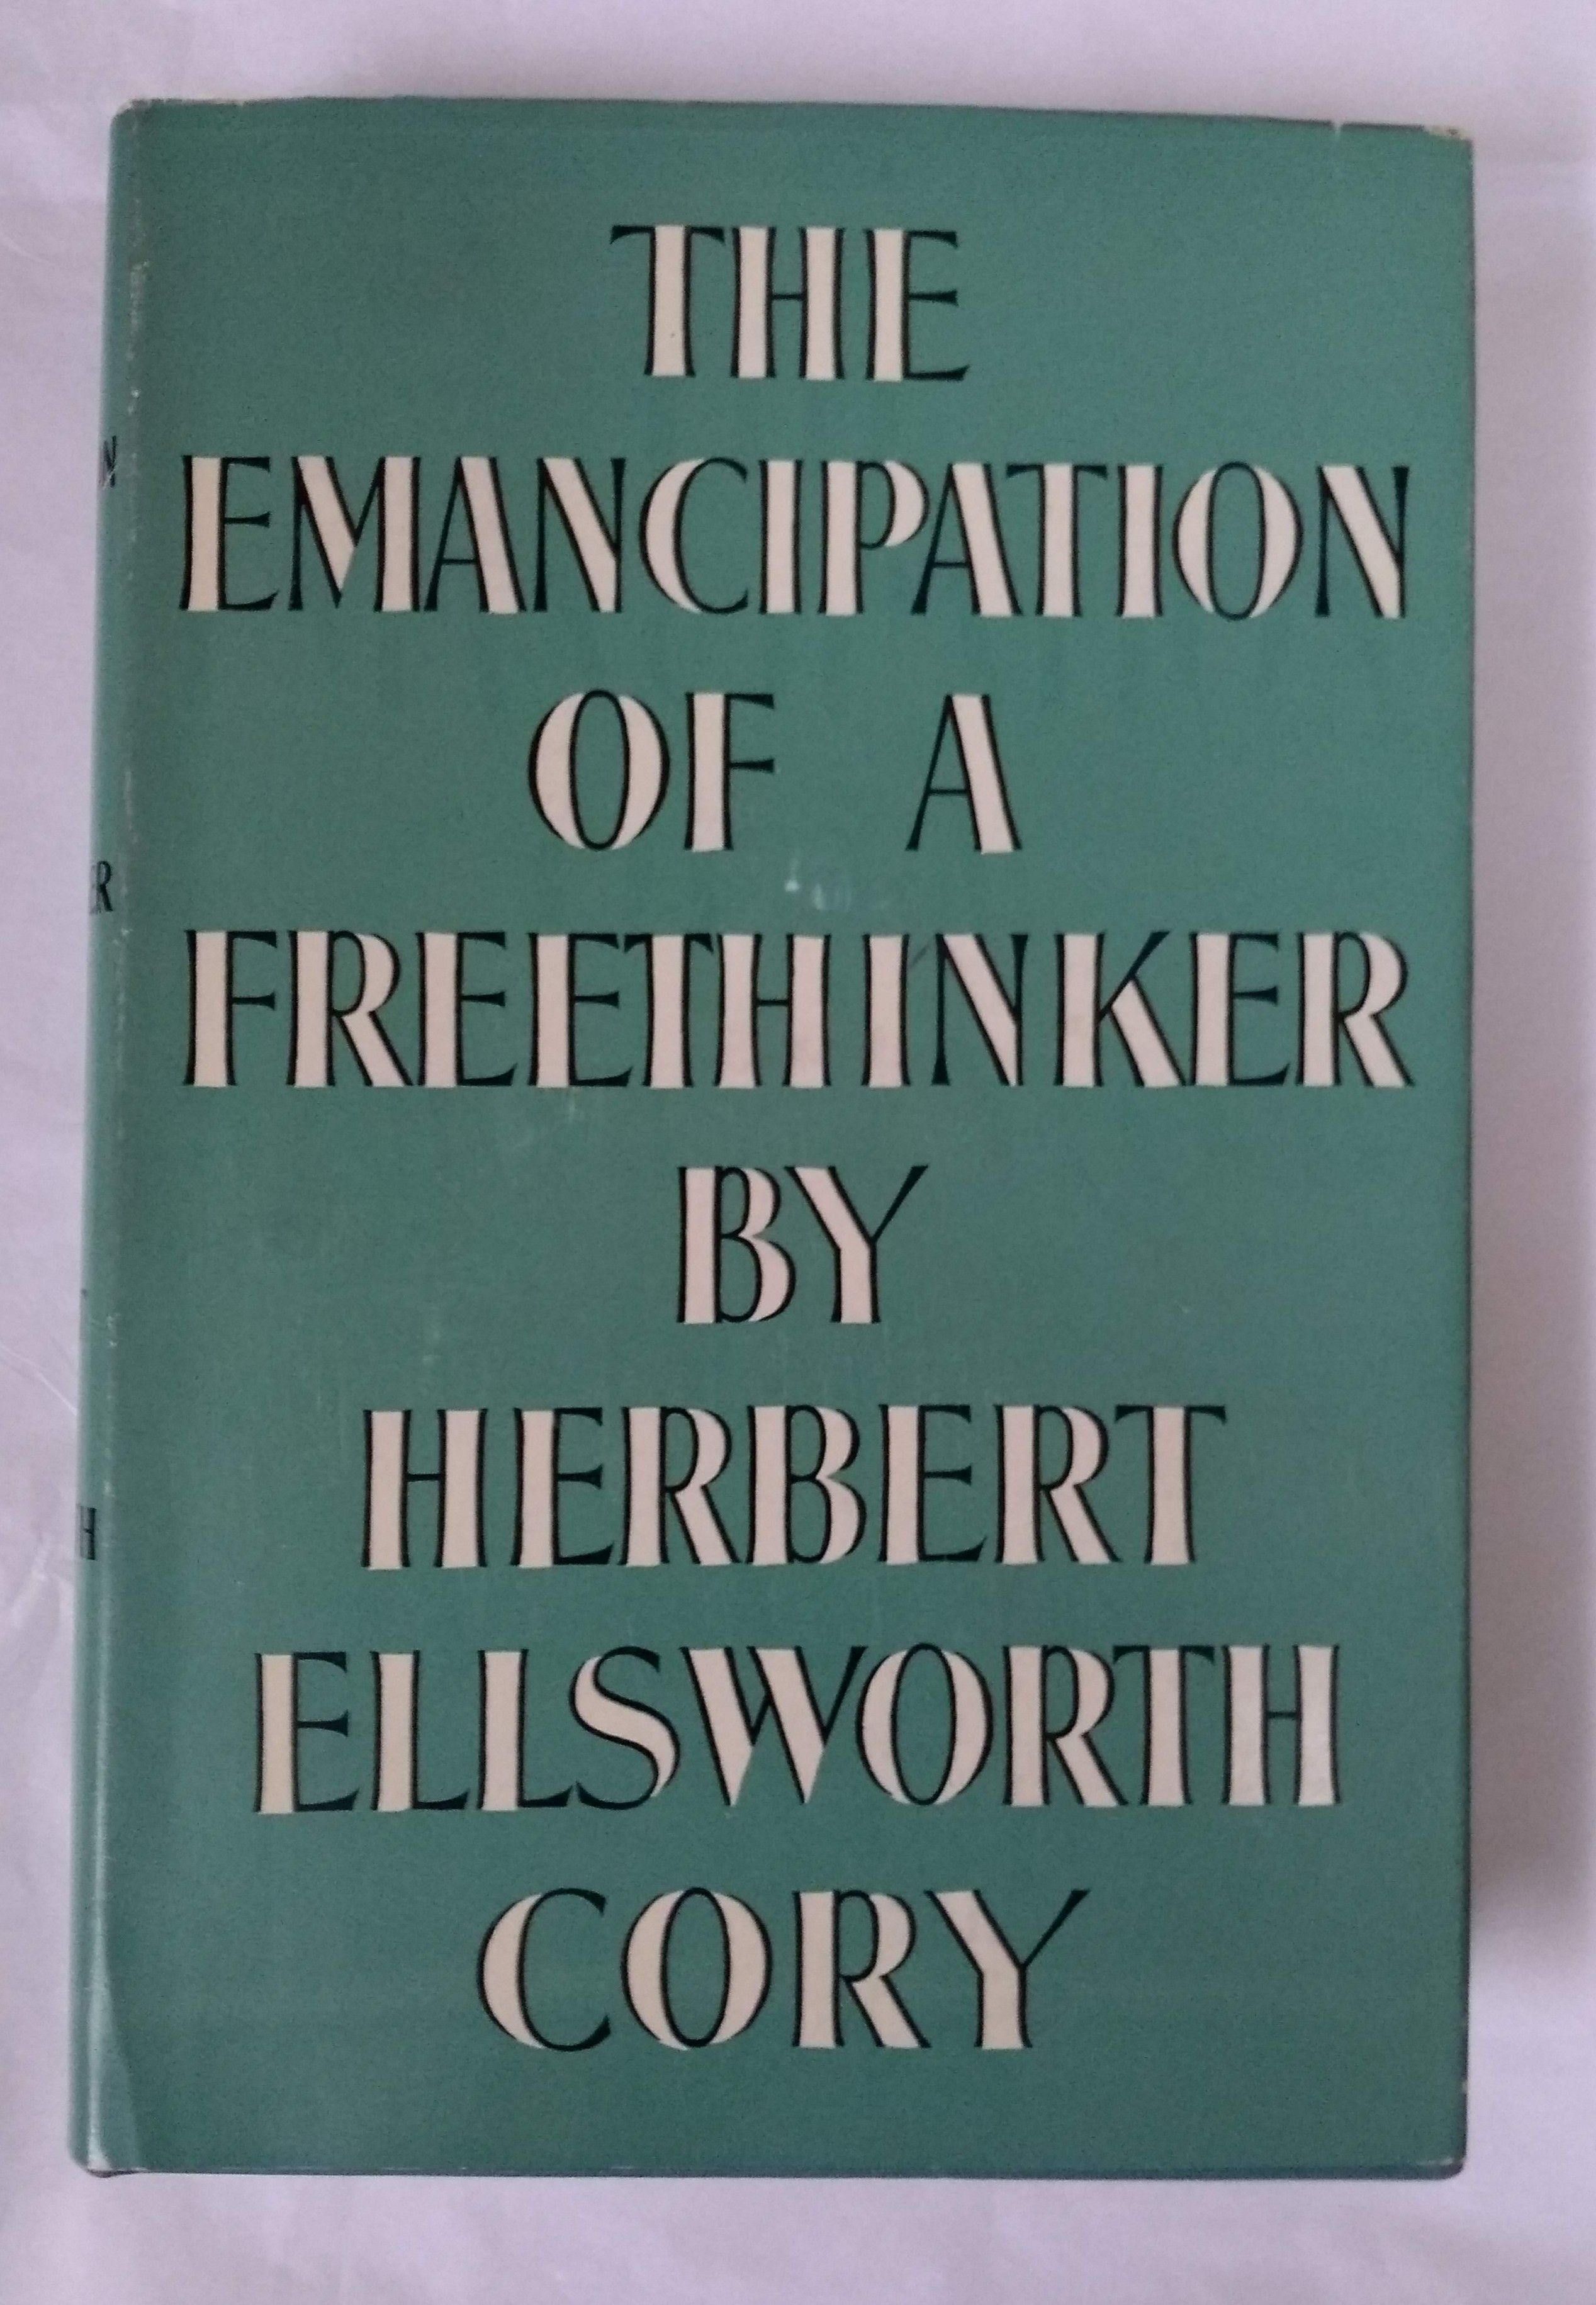 The Emancipation of a Freethinker, Cory, Herbert Ellsworth